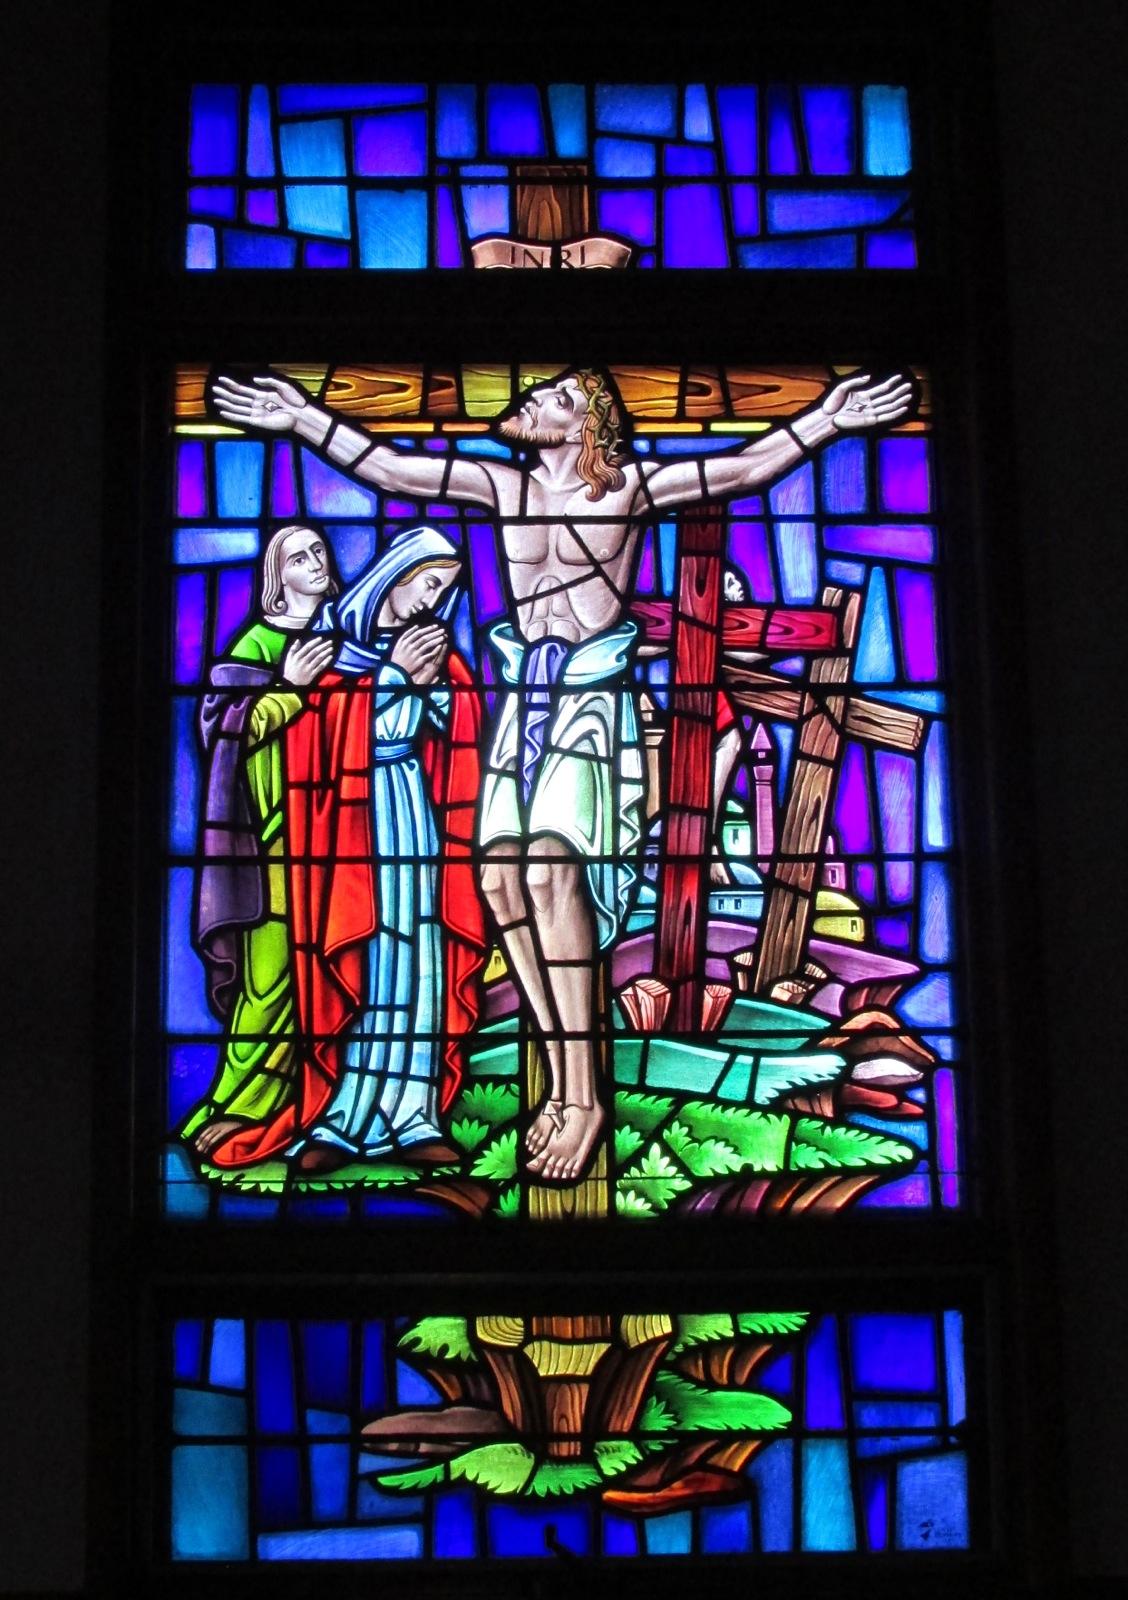 Sea Isle City Methodist Church stained glass window Jesus hanging on the cross